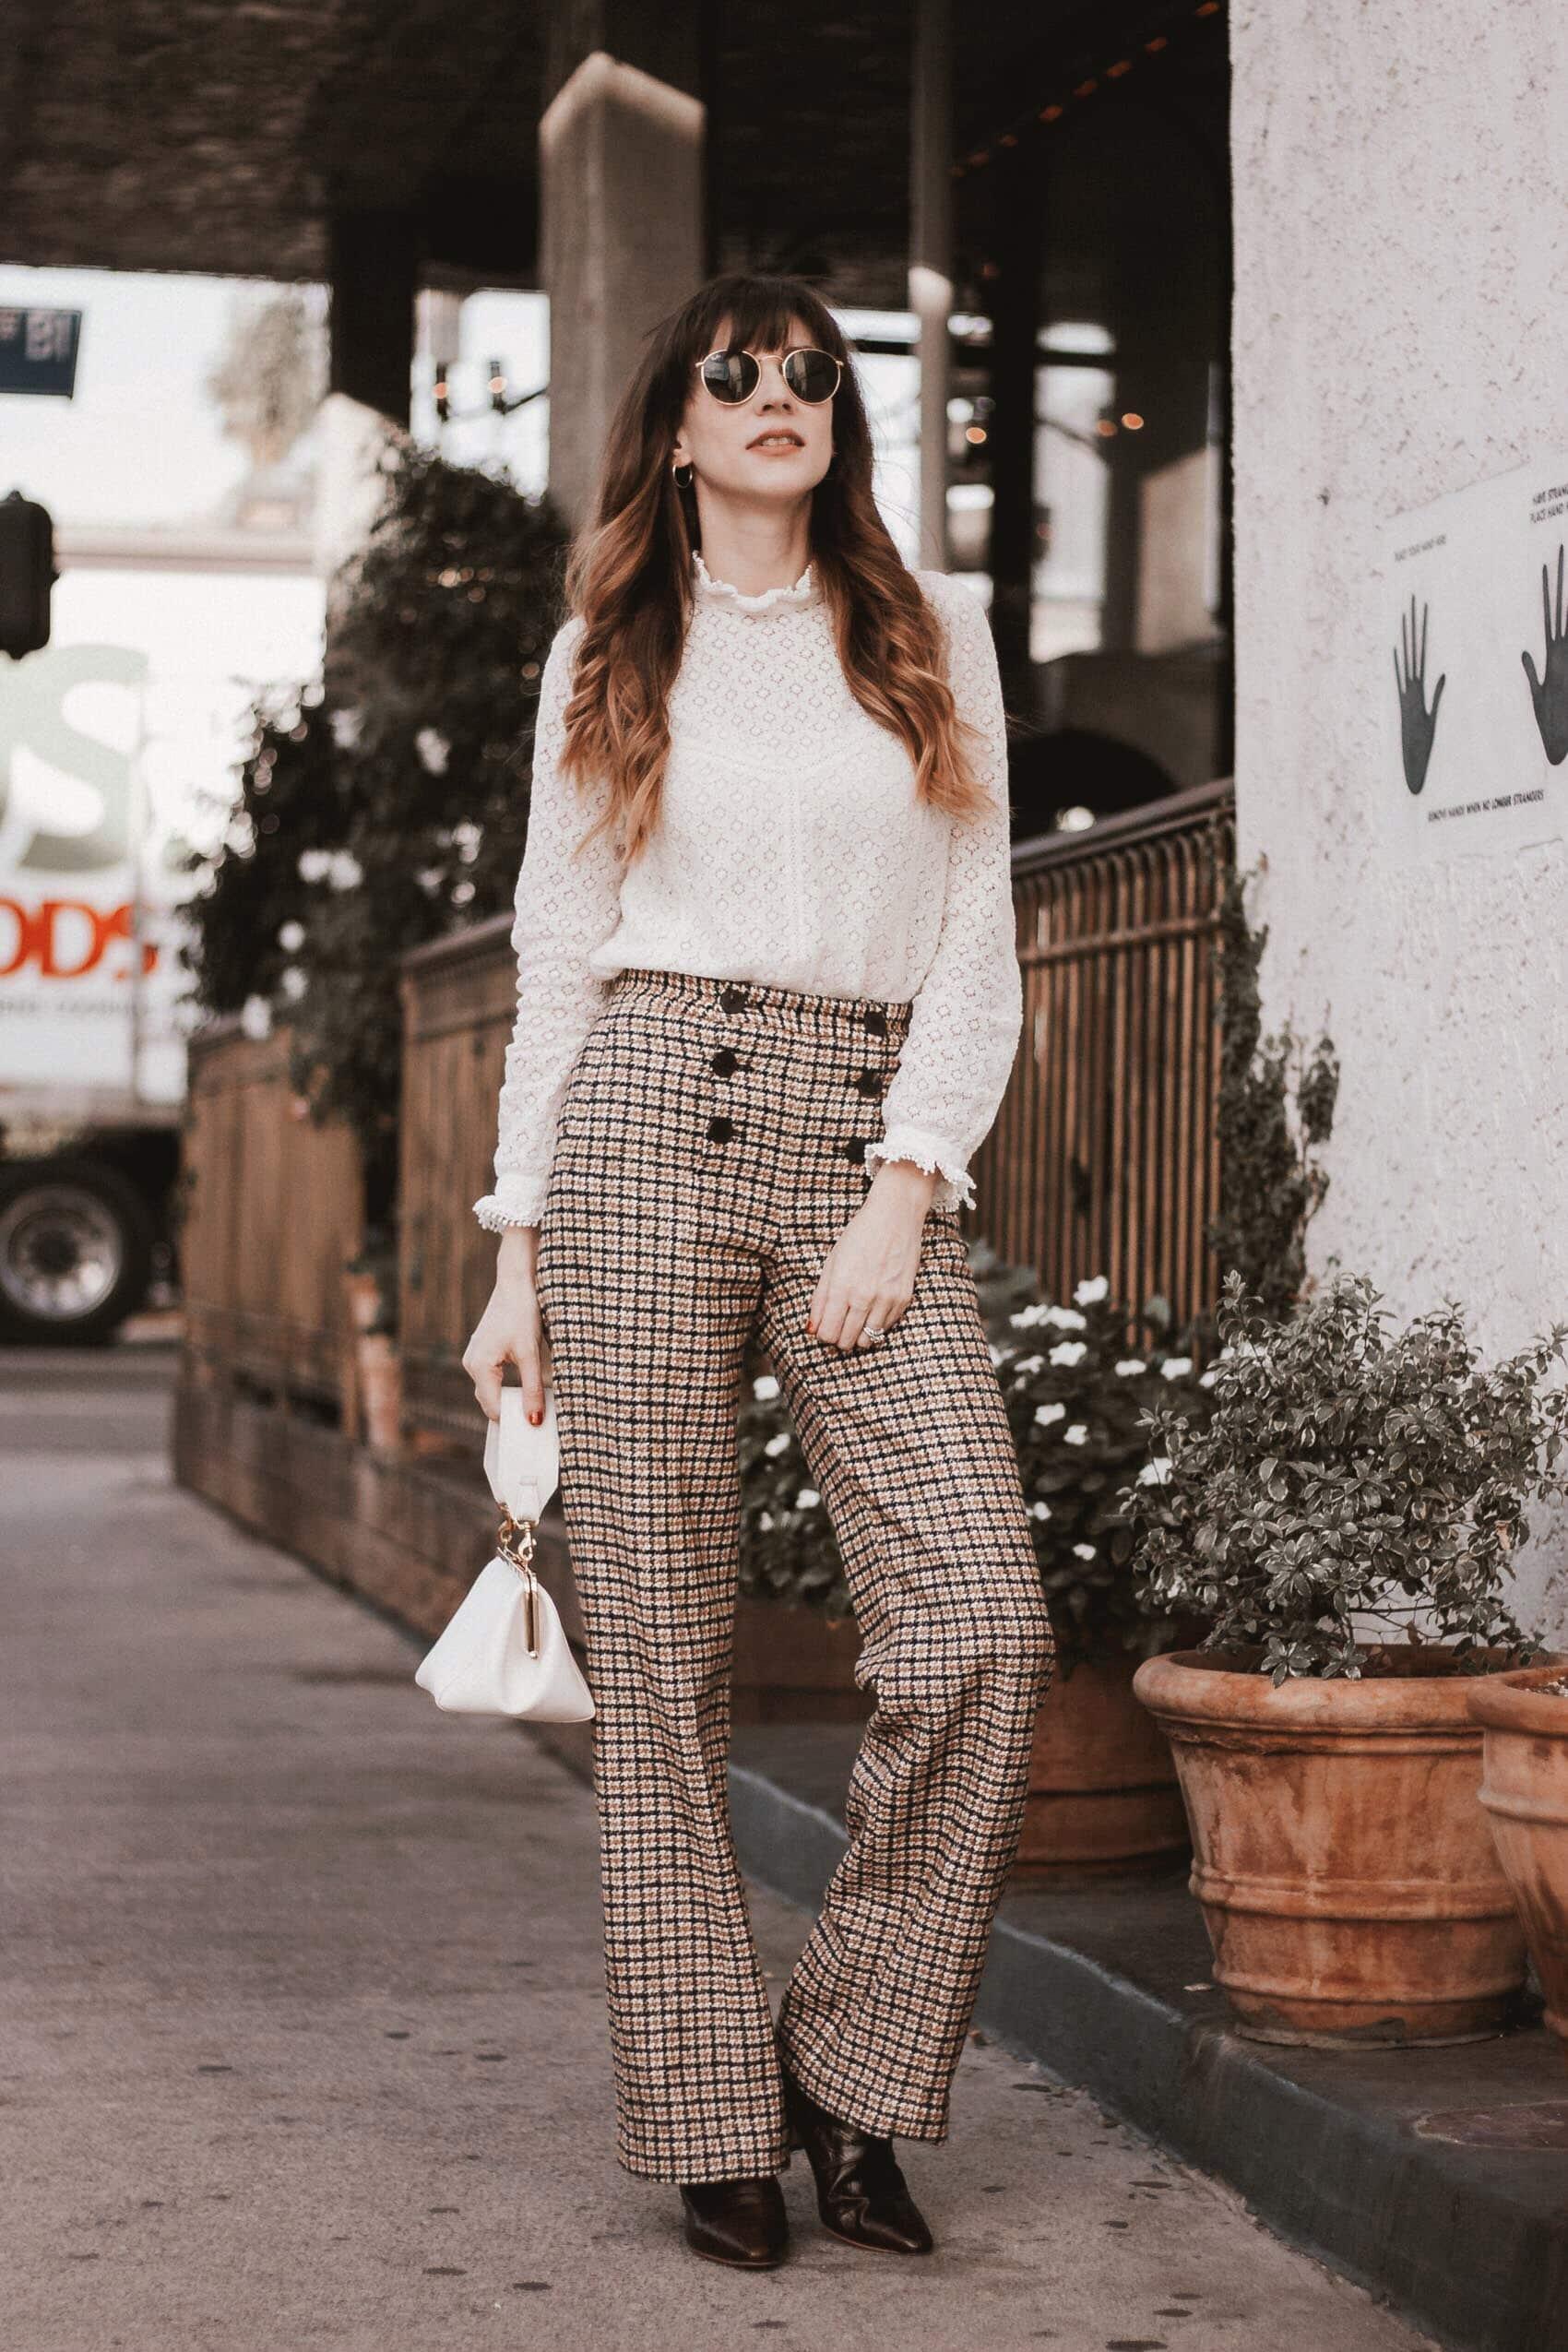 Plaid wool pants, lace top, mini white bag, croc boots